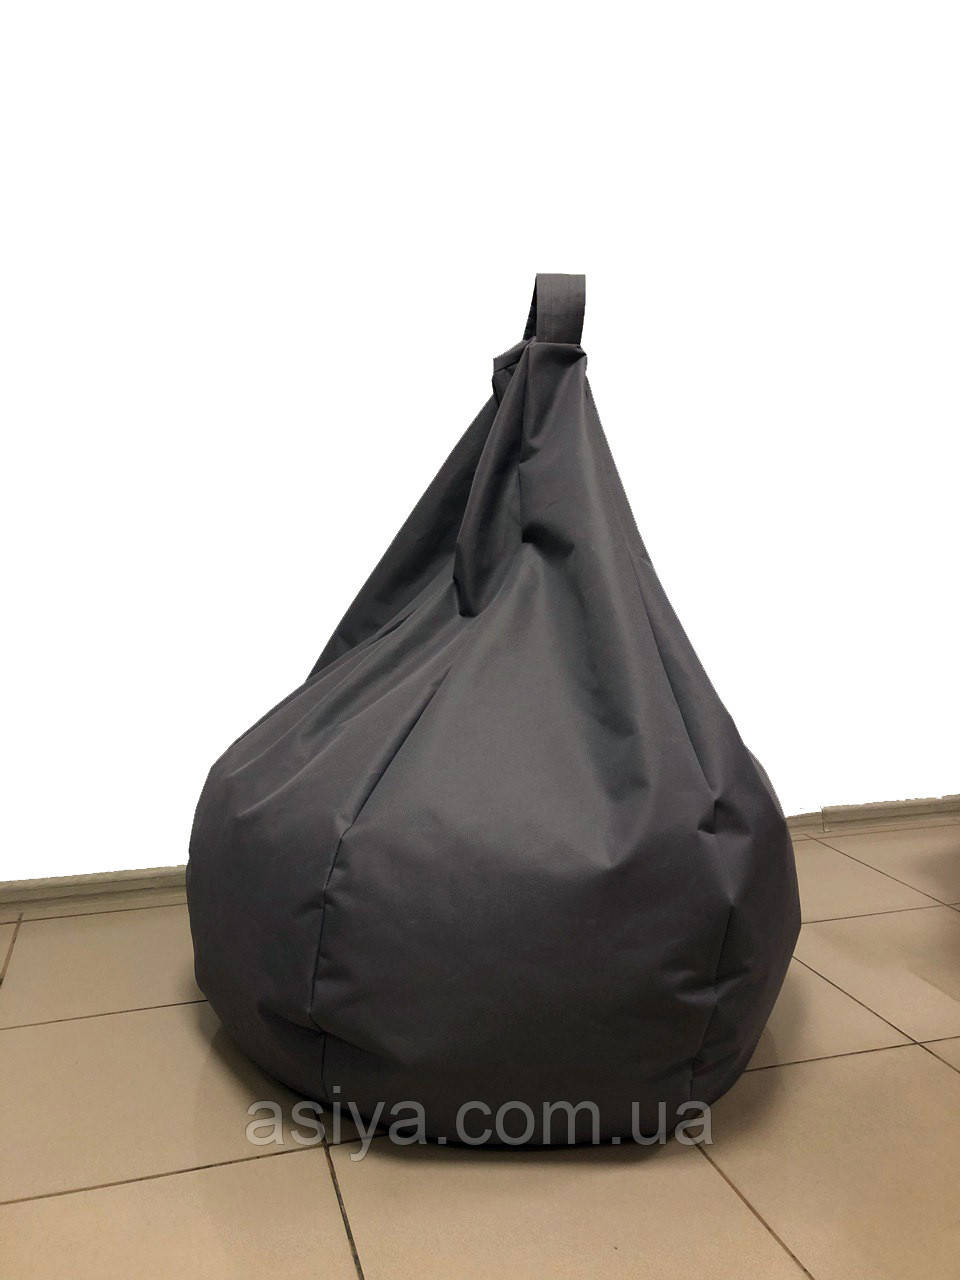 Мягкое кресло подушка груша мешок, размер XXL-120 см. Серый цвет